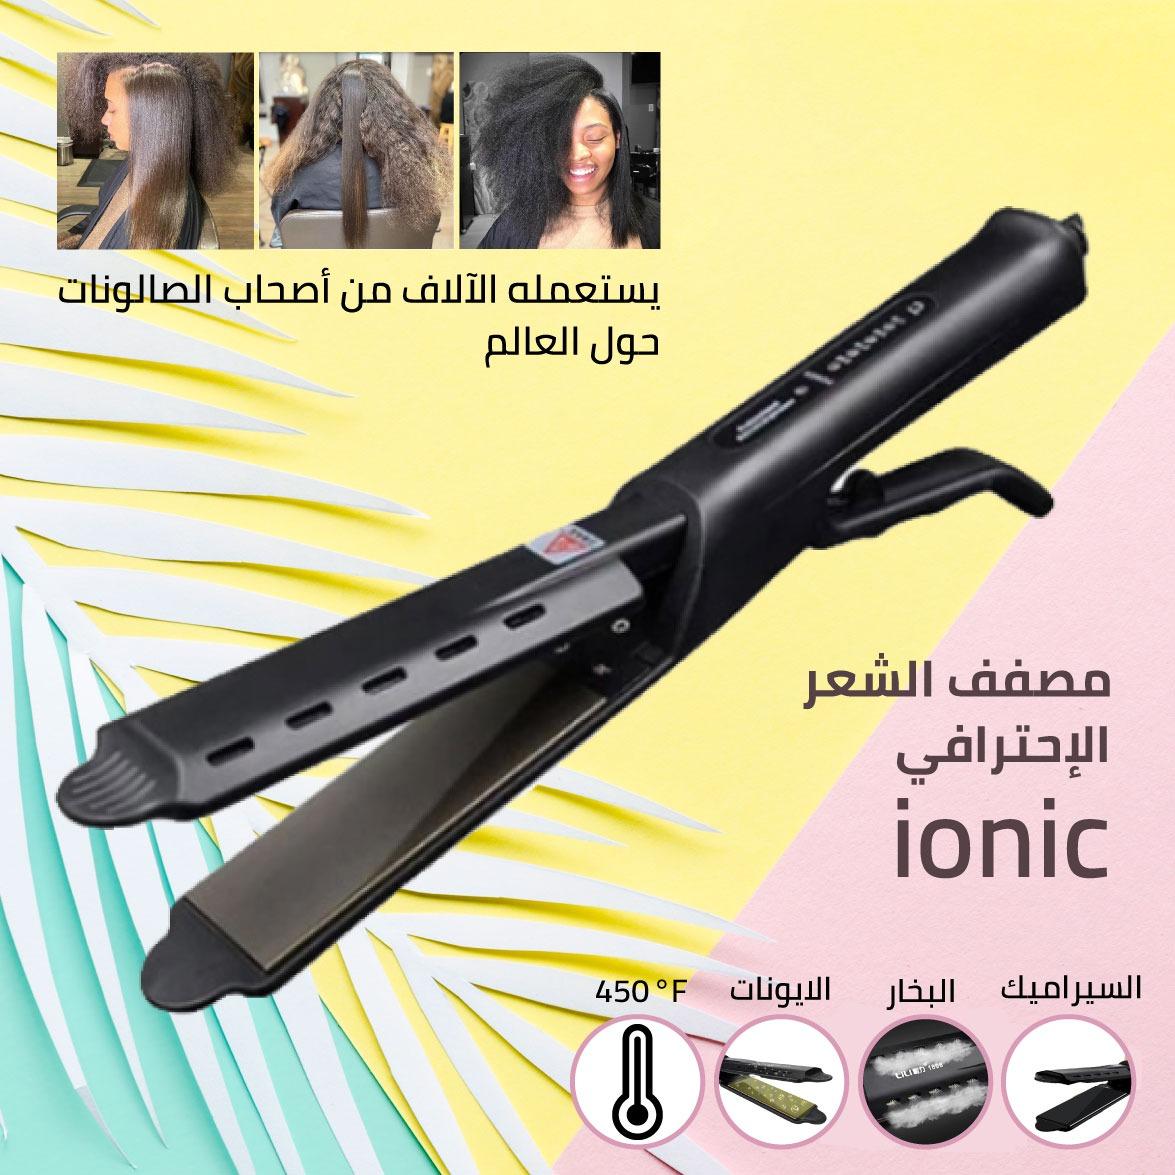 ionic مصفف الشعر الاحترافي